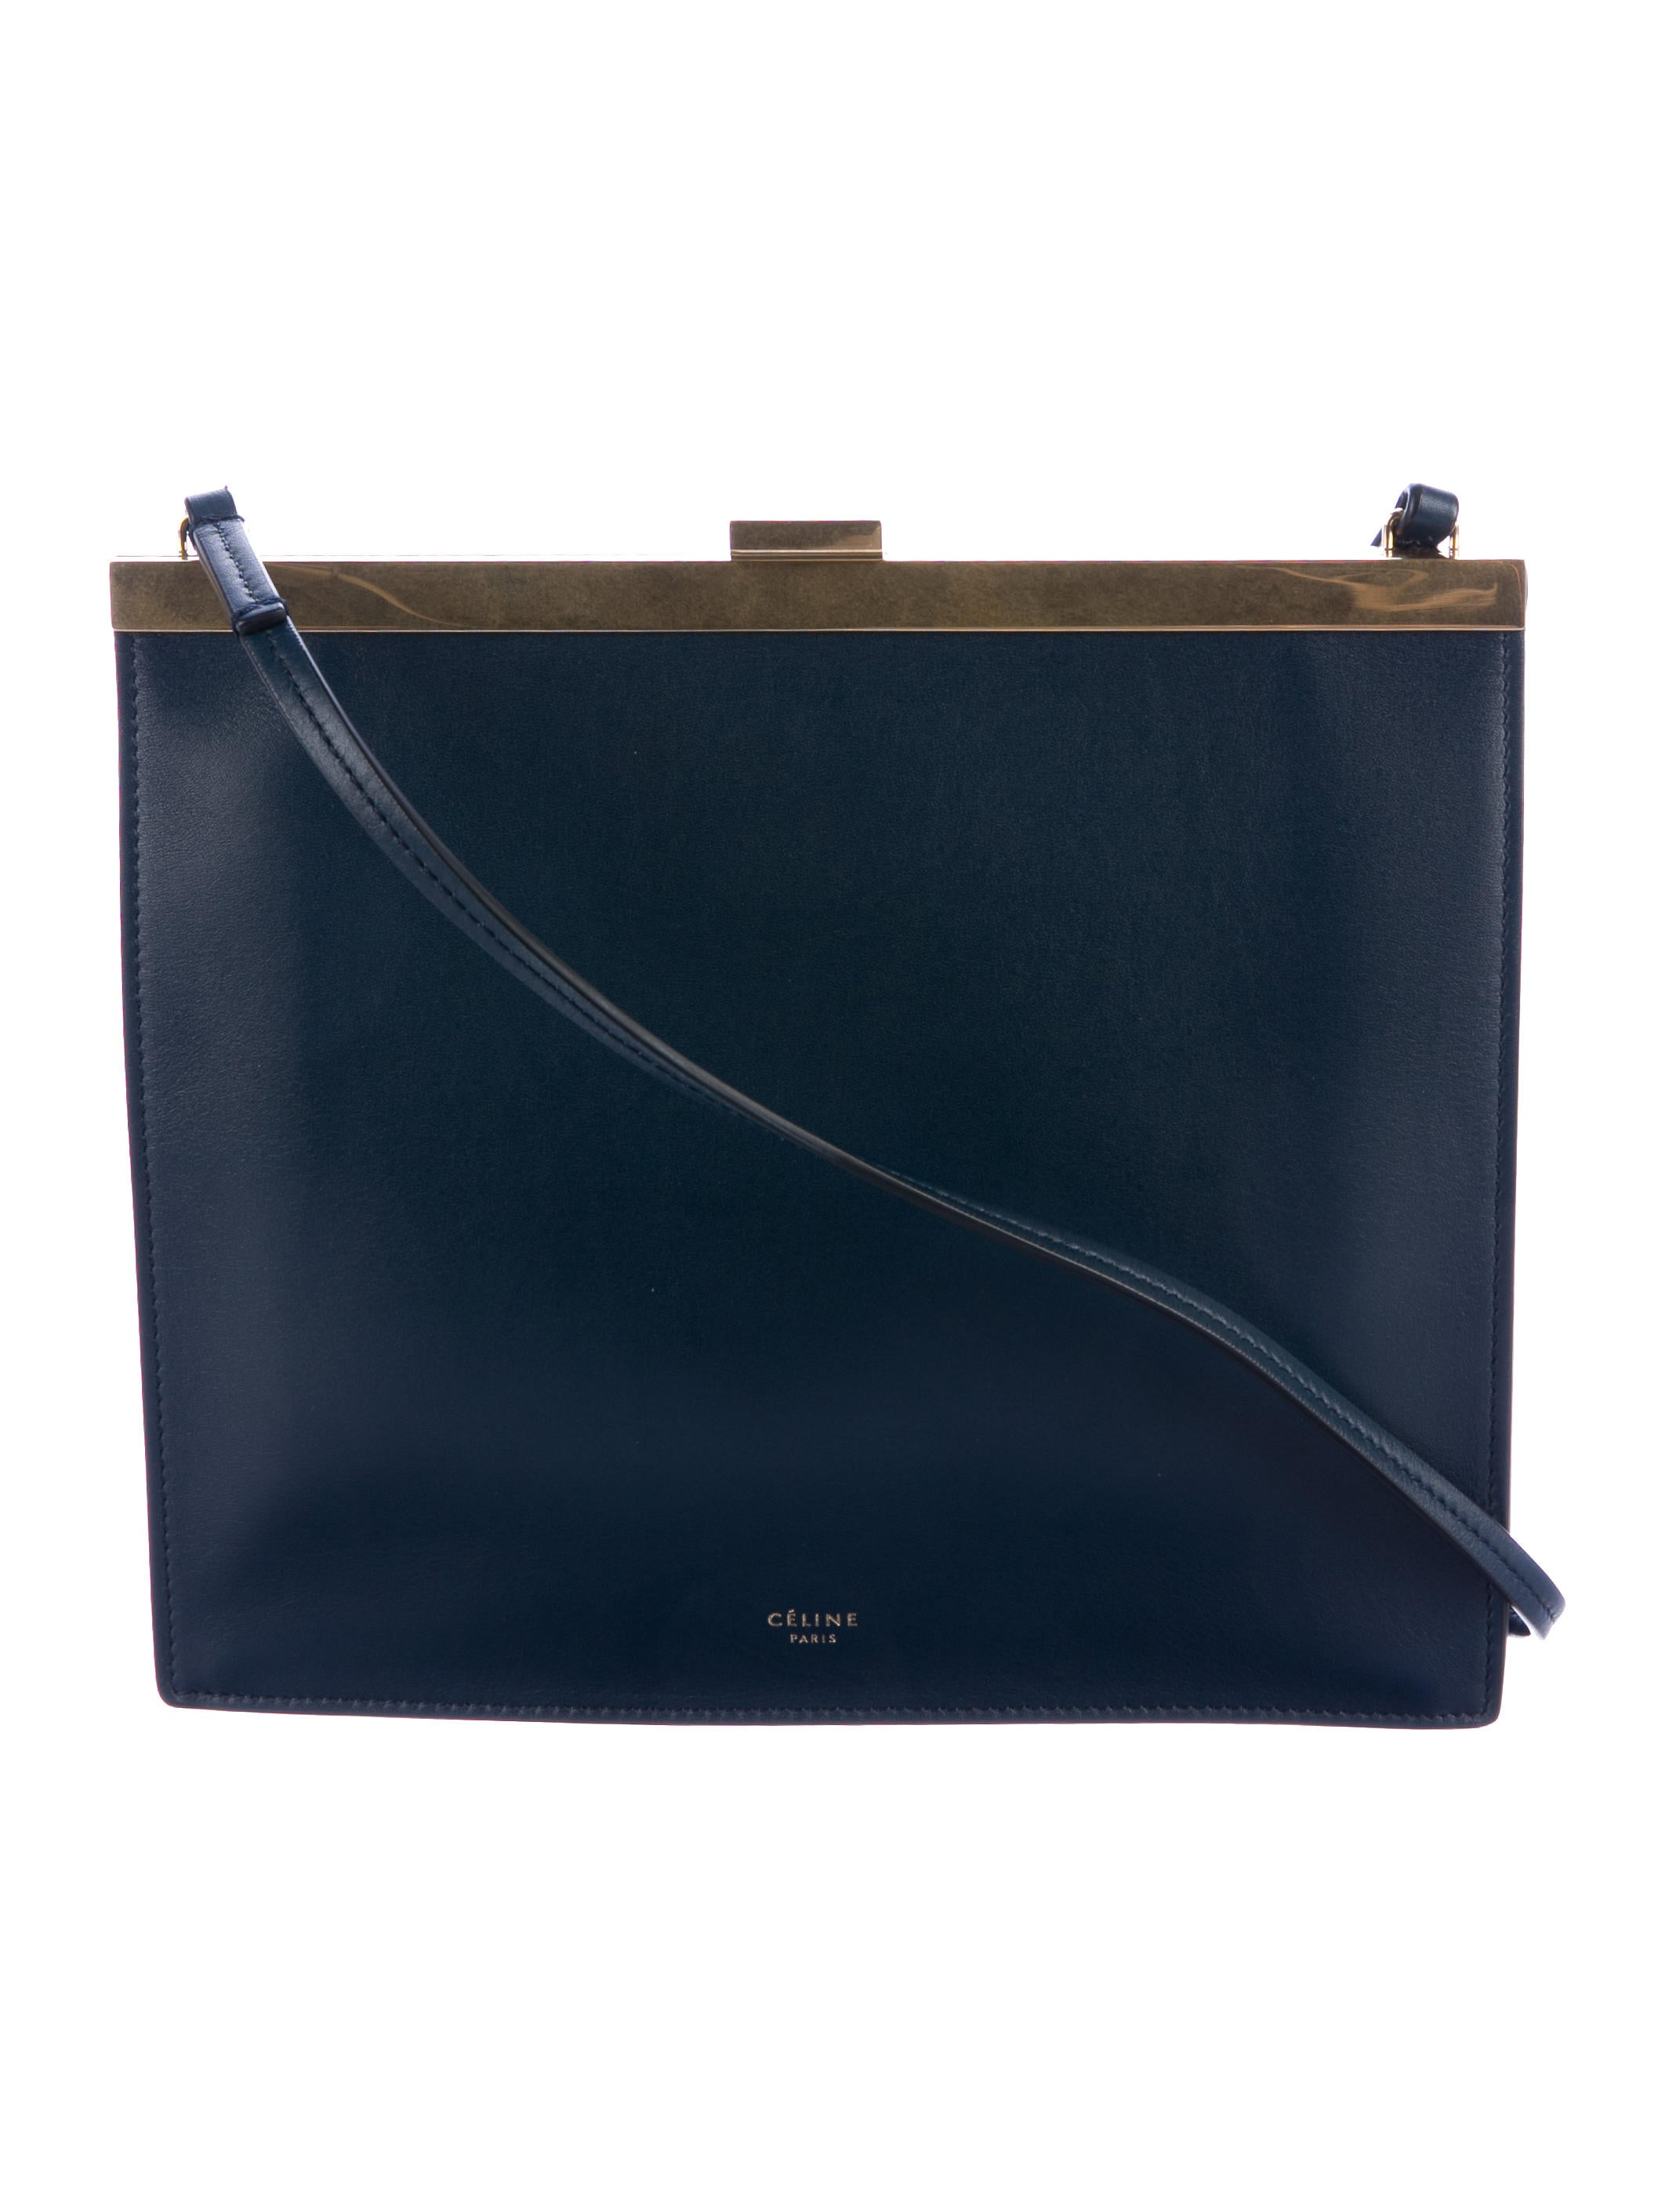 7c8da8f877f7 Celine 2017 Céline Mini Clasp Shoulder Bag - Handbags - CEL57938 ...